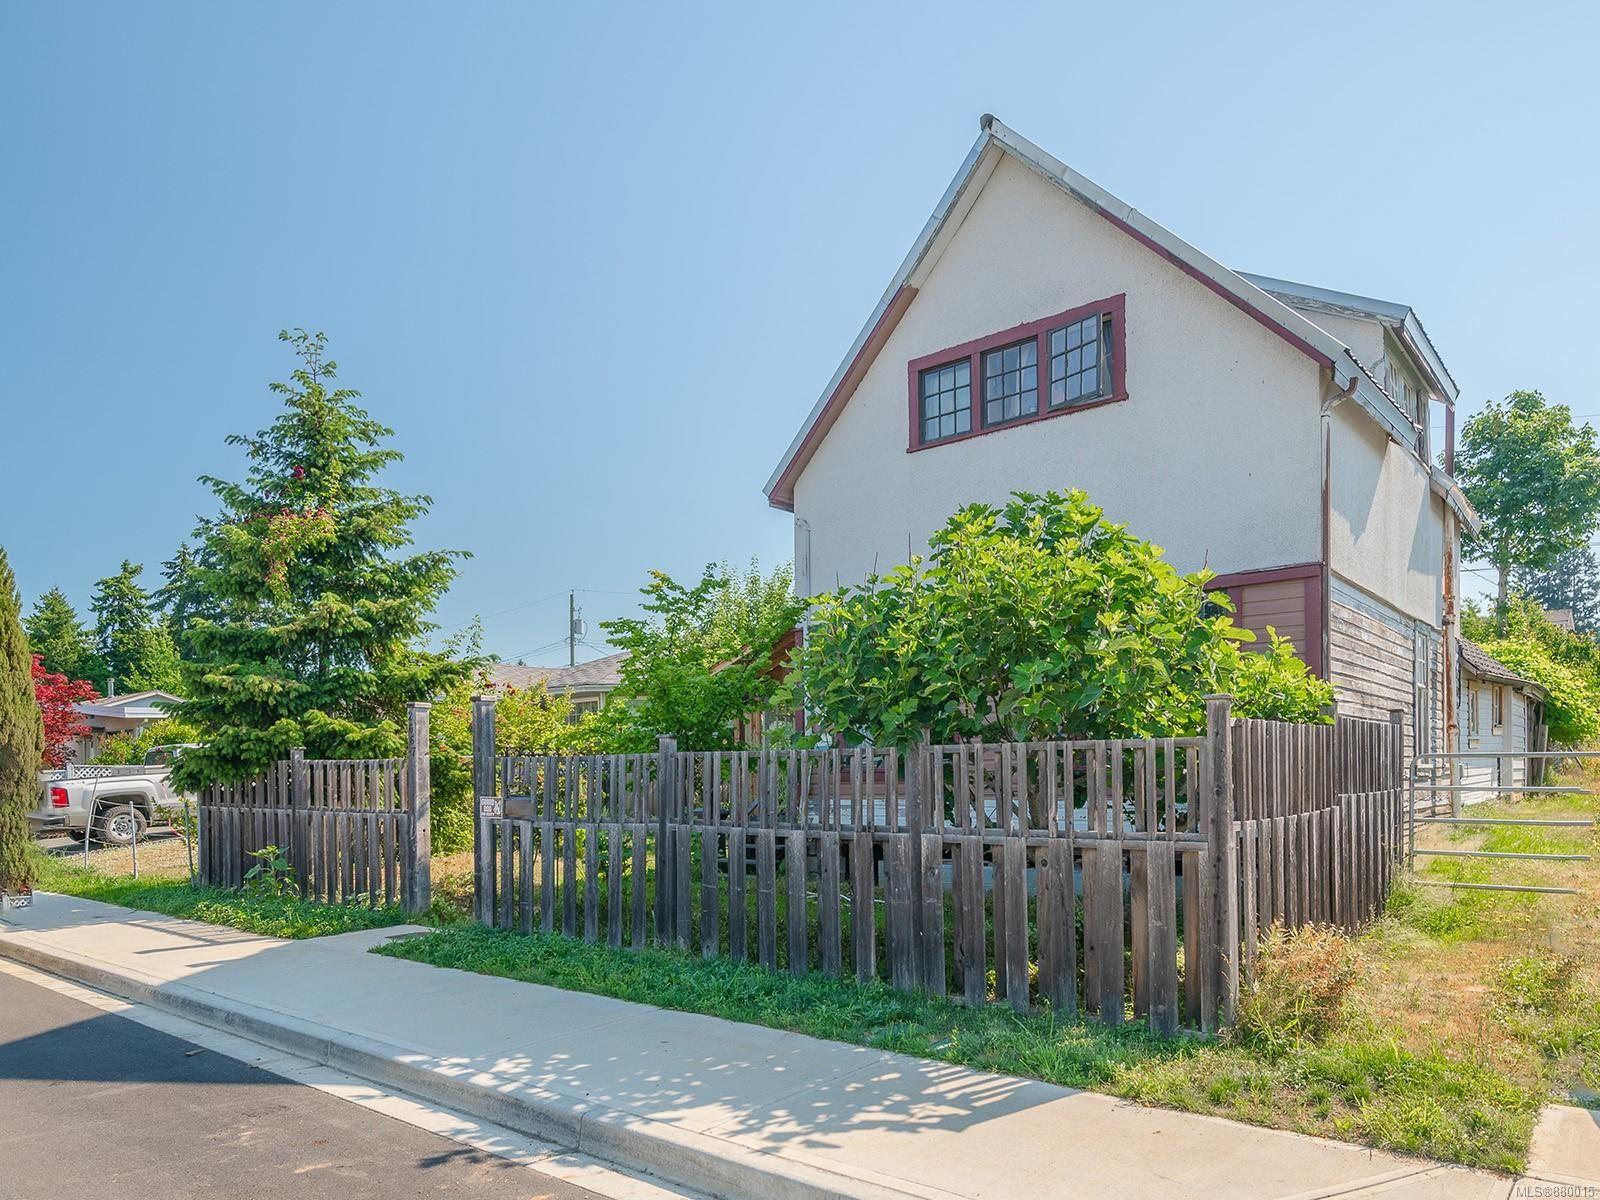 Main Photo: 2667 4th Ave in : PA Port Alberni House for sale (Port Alberni)  : MLS®# 880015